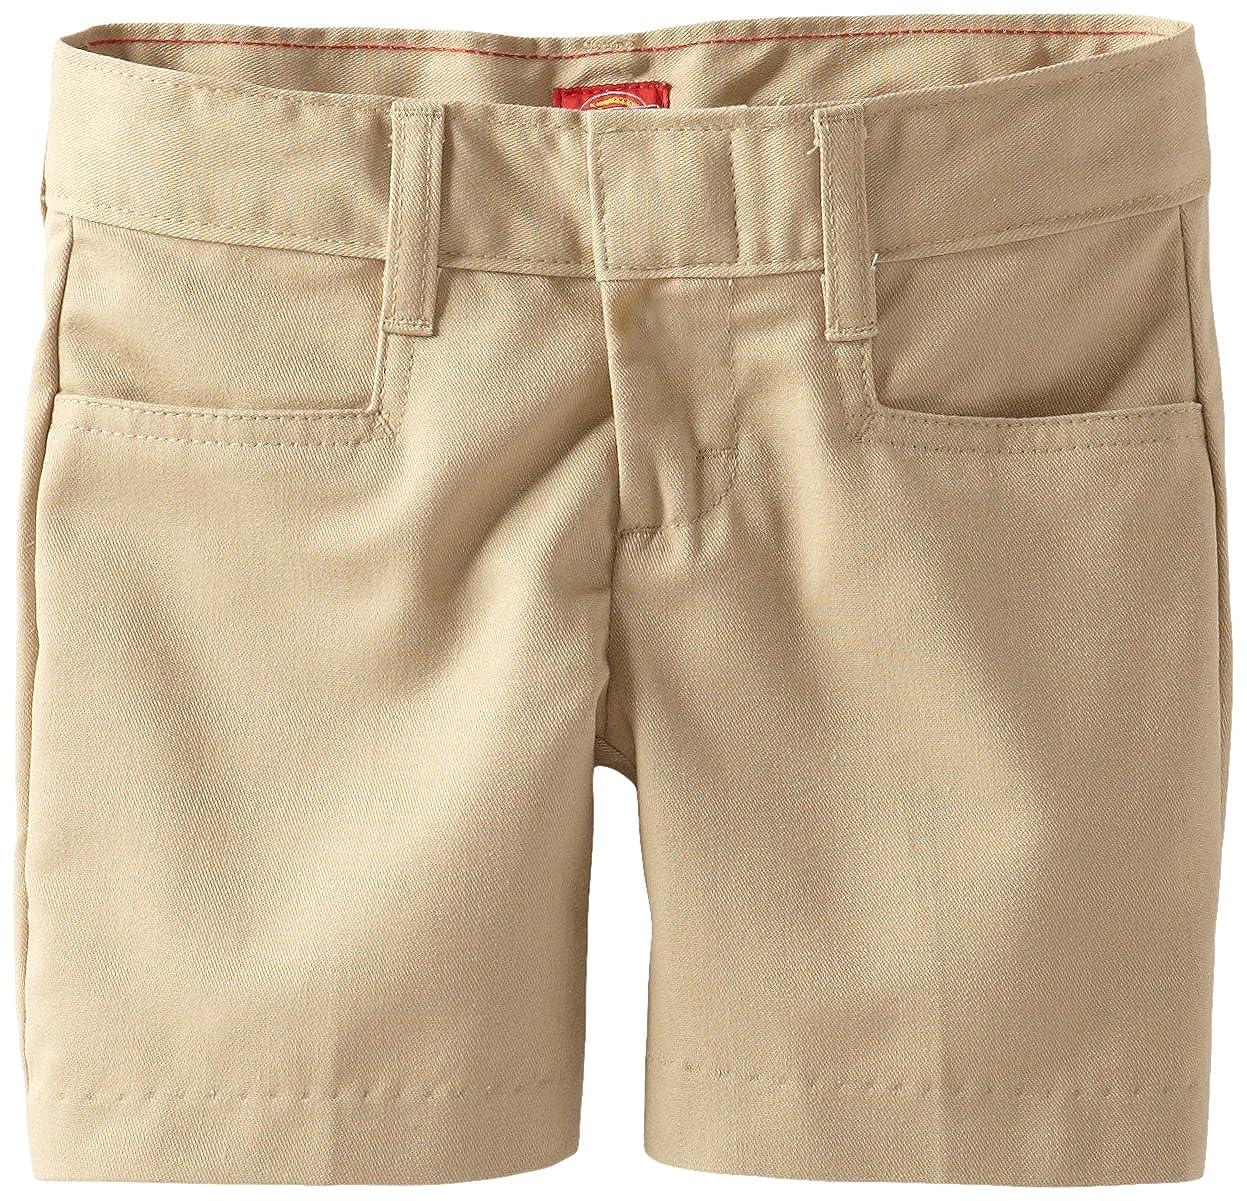 Dickies Girls Uniform Classic Short Dickies Kids KR311